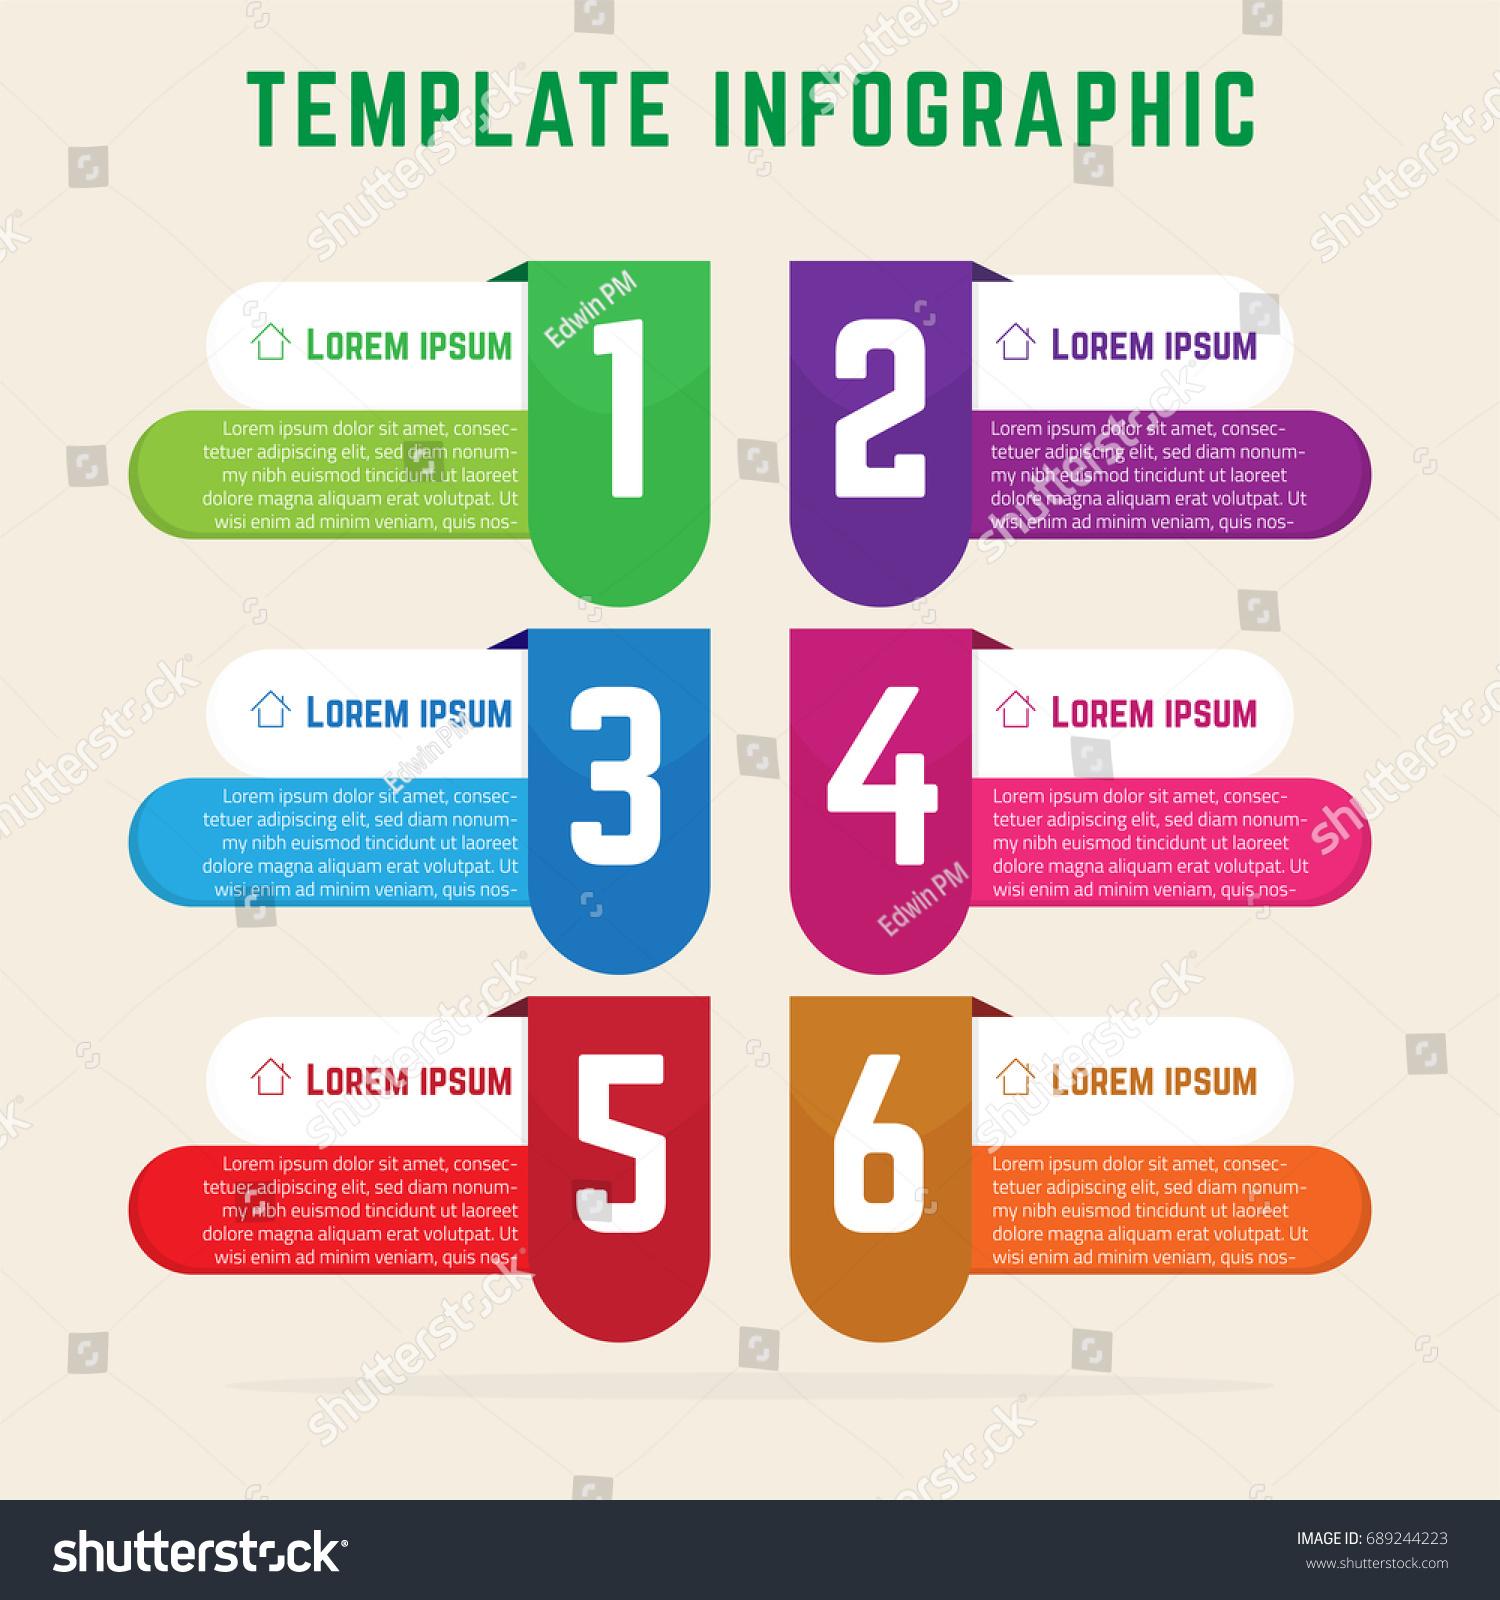 template infographic simple elegant infographics stock stock vector